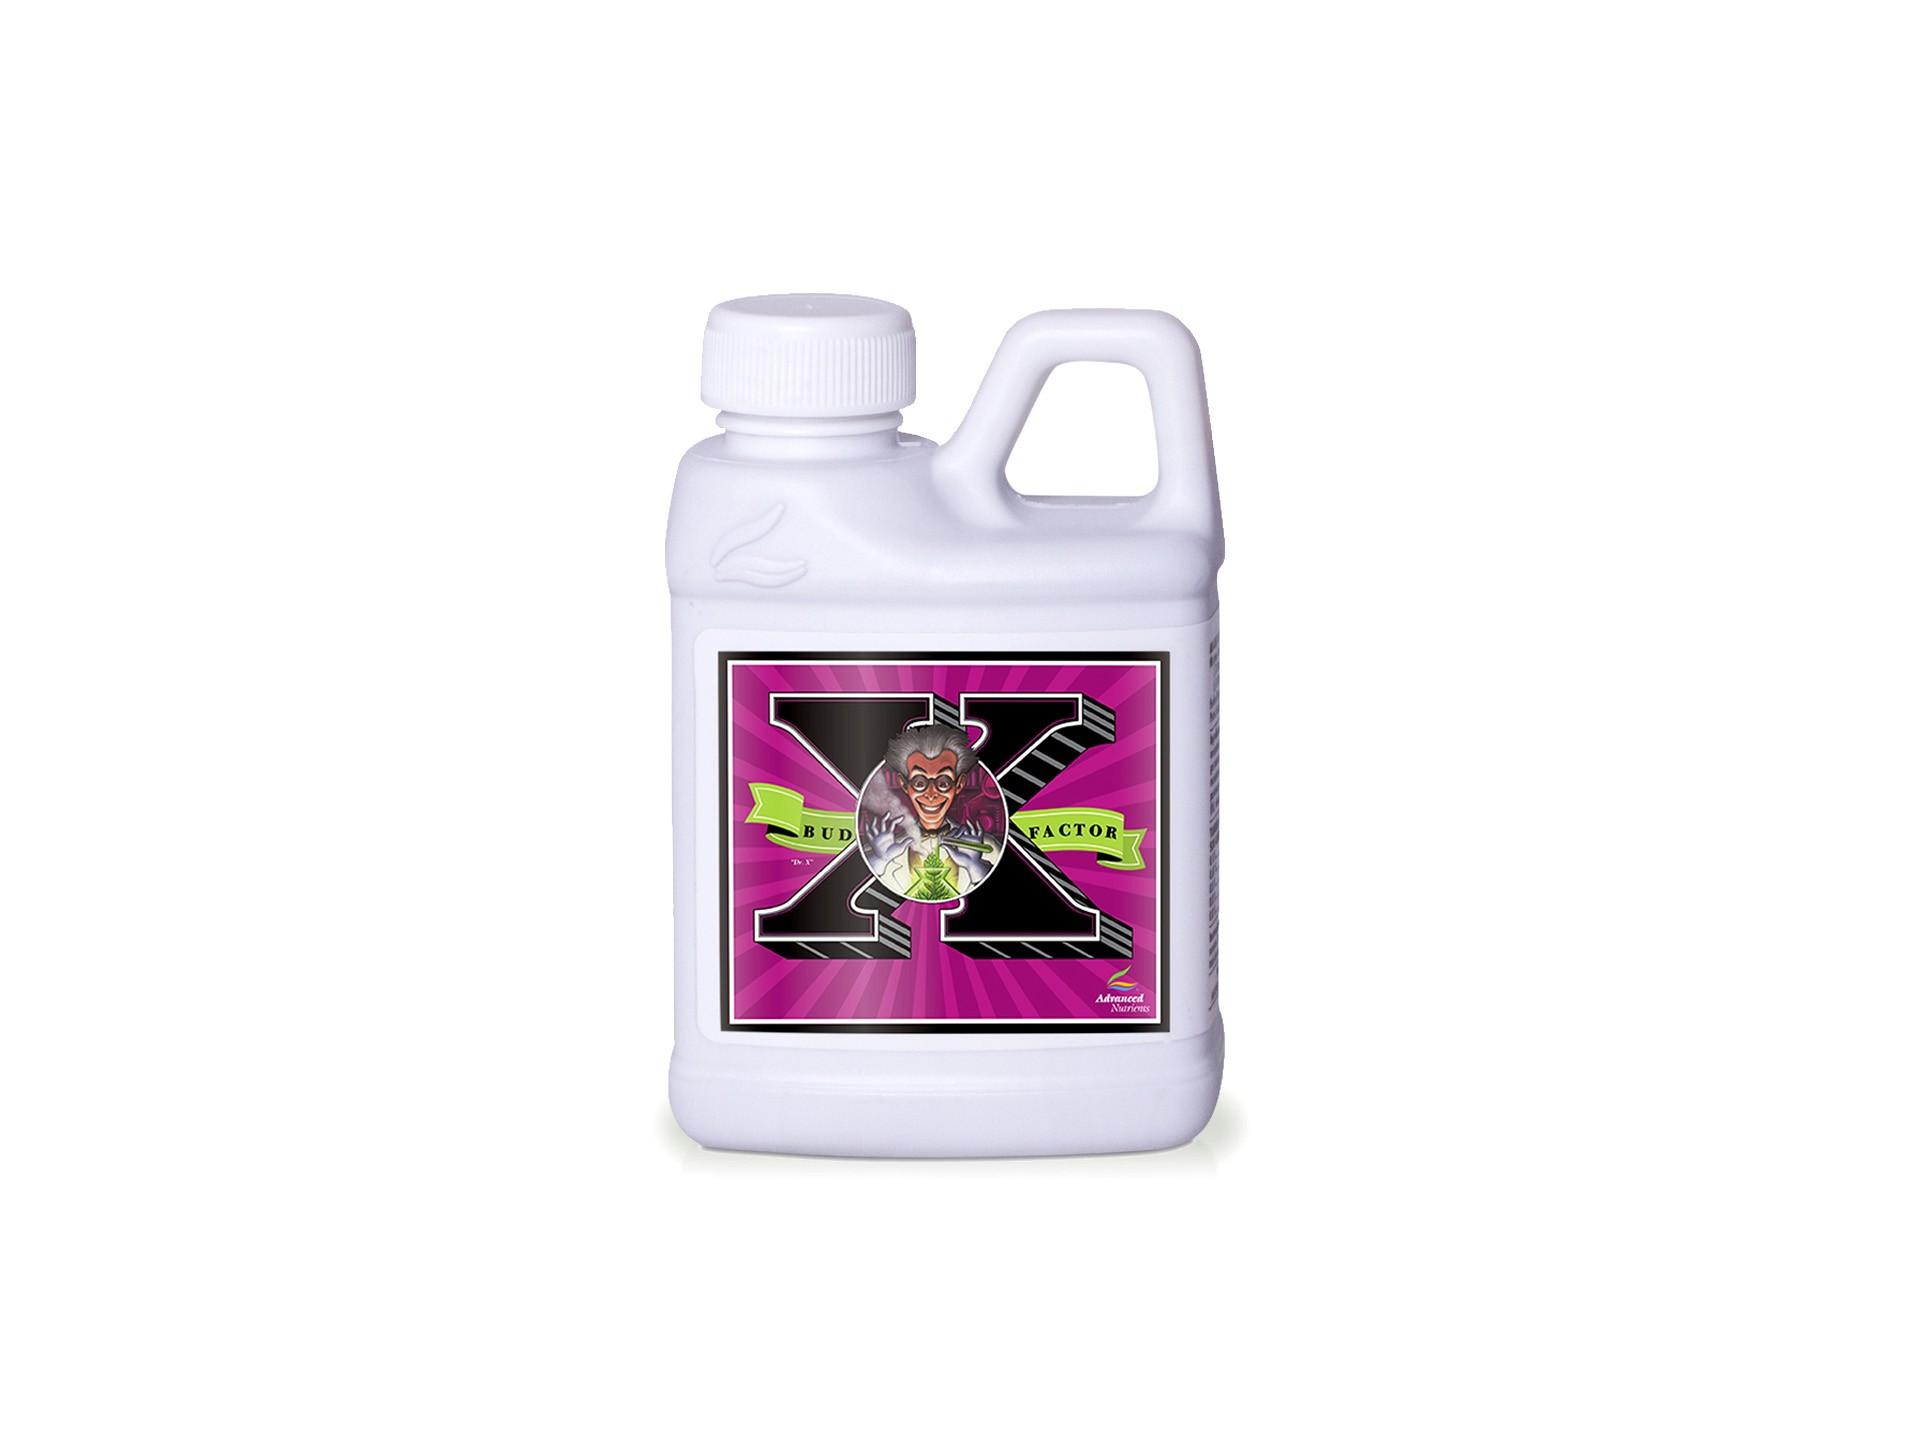 Bud Factor X 250ml